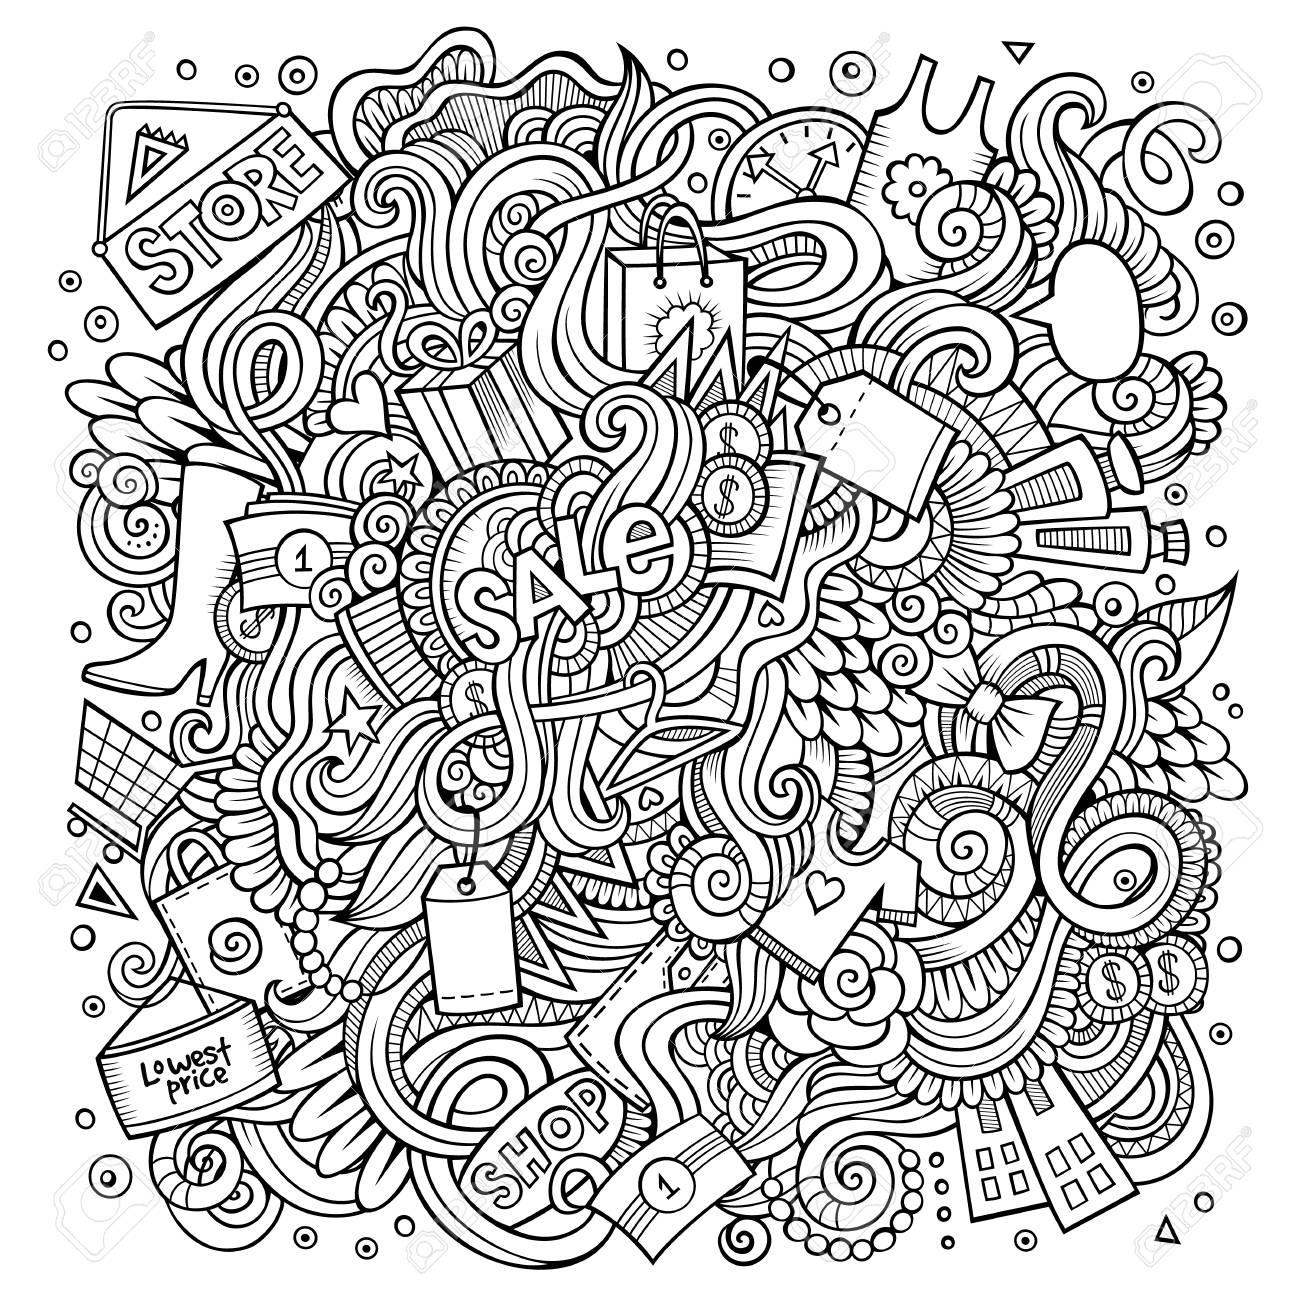 Dessin Anime Mignon Doodles Dessines A La Main Illustration